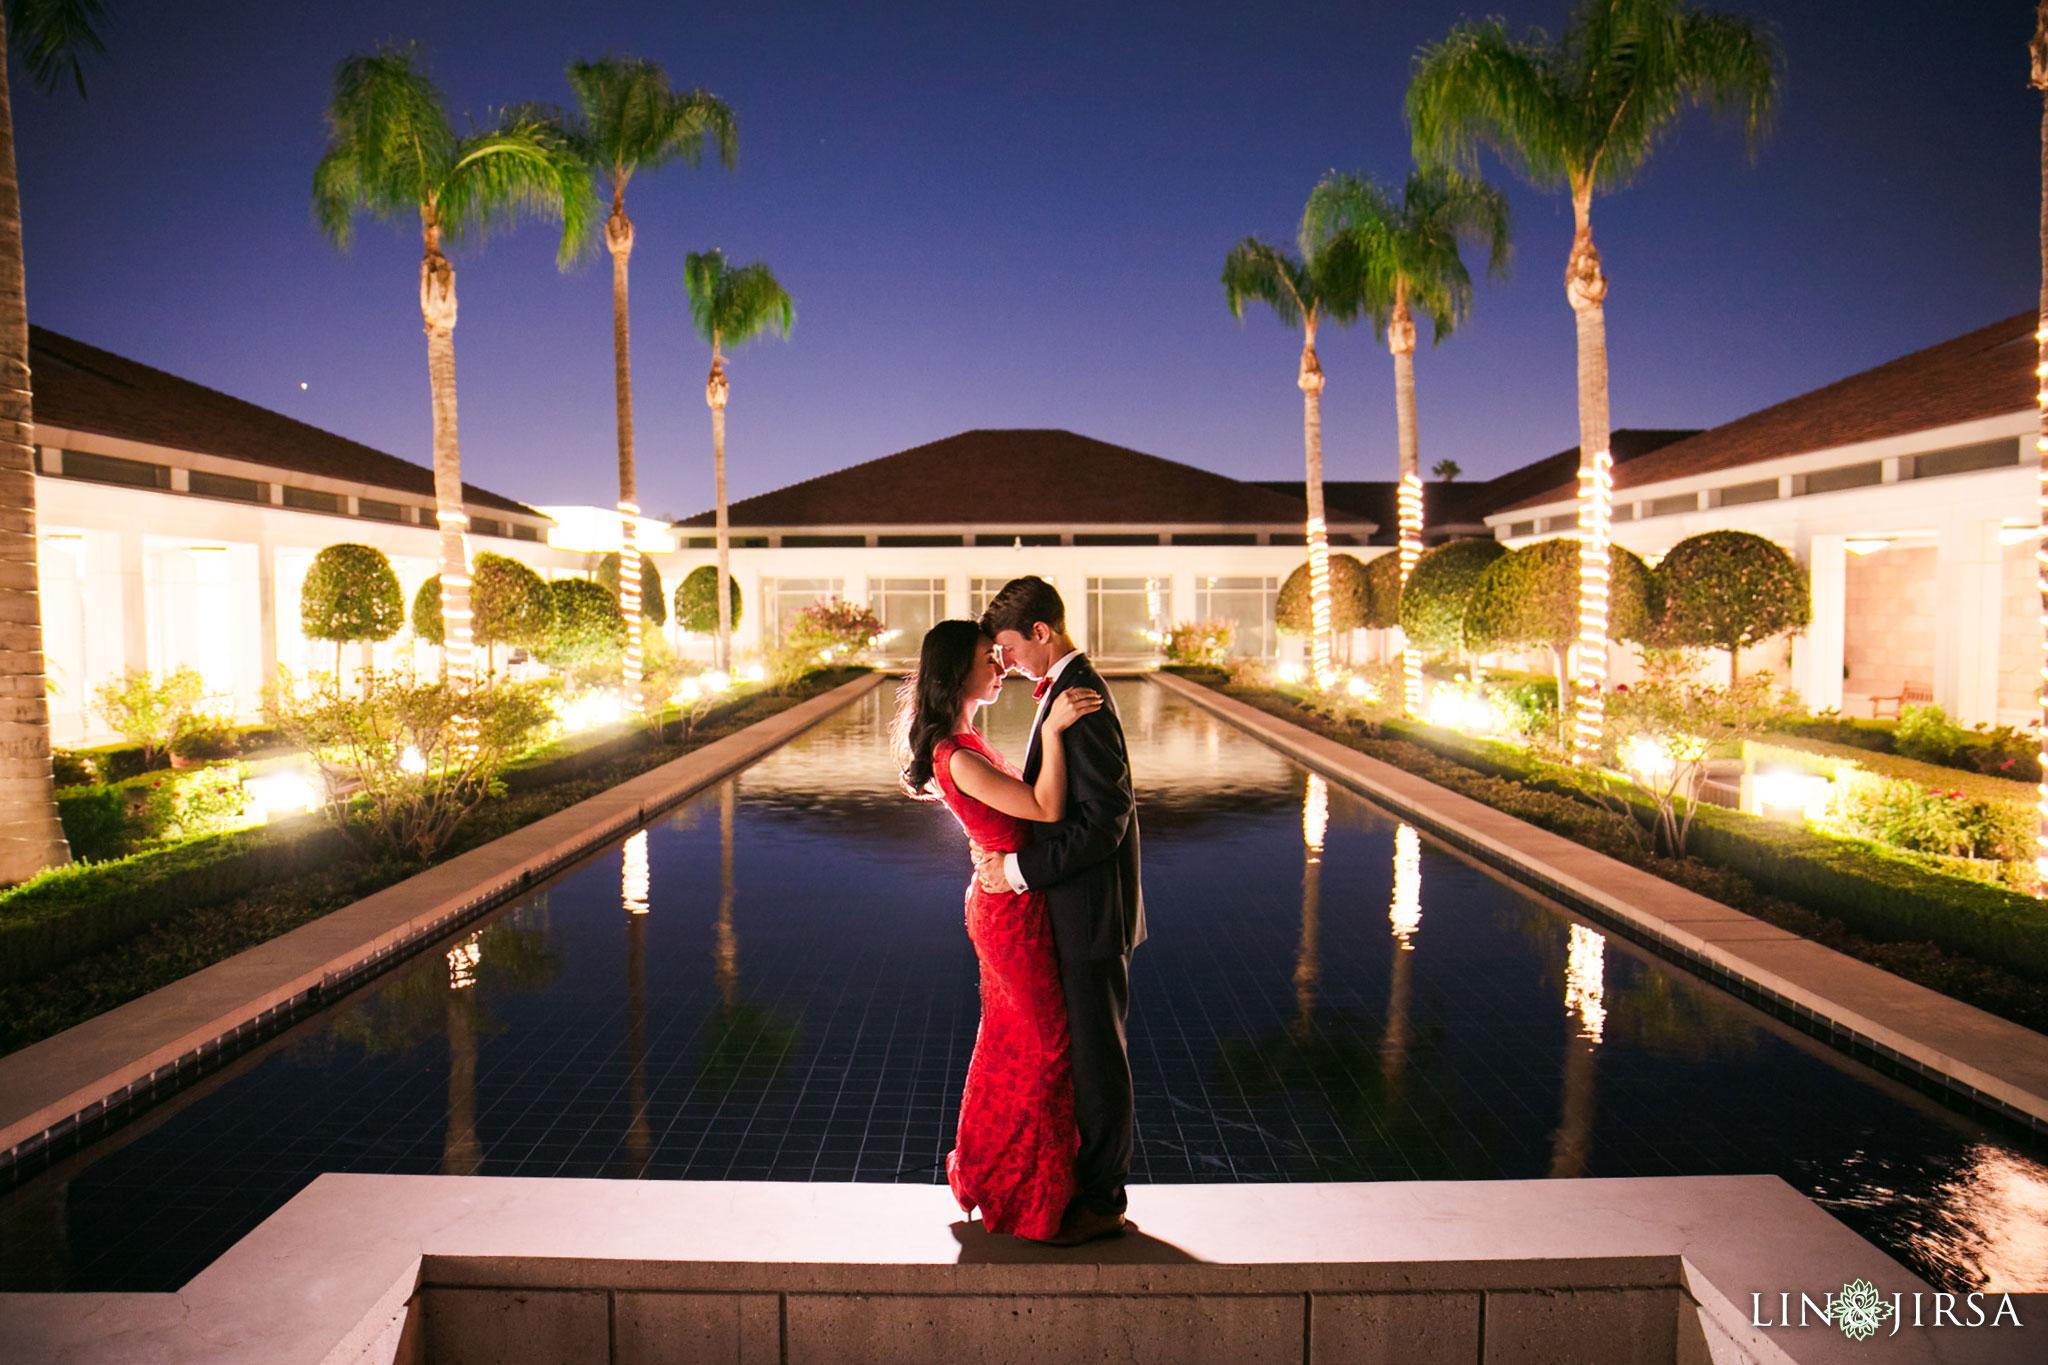 031 richard nixon library wedding reception photography 1